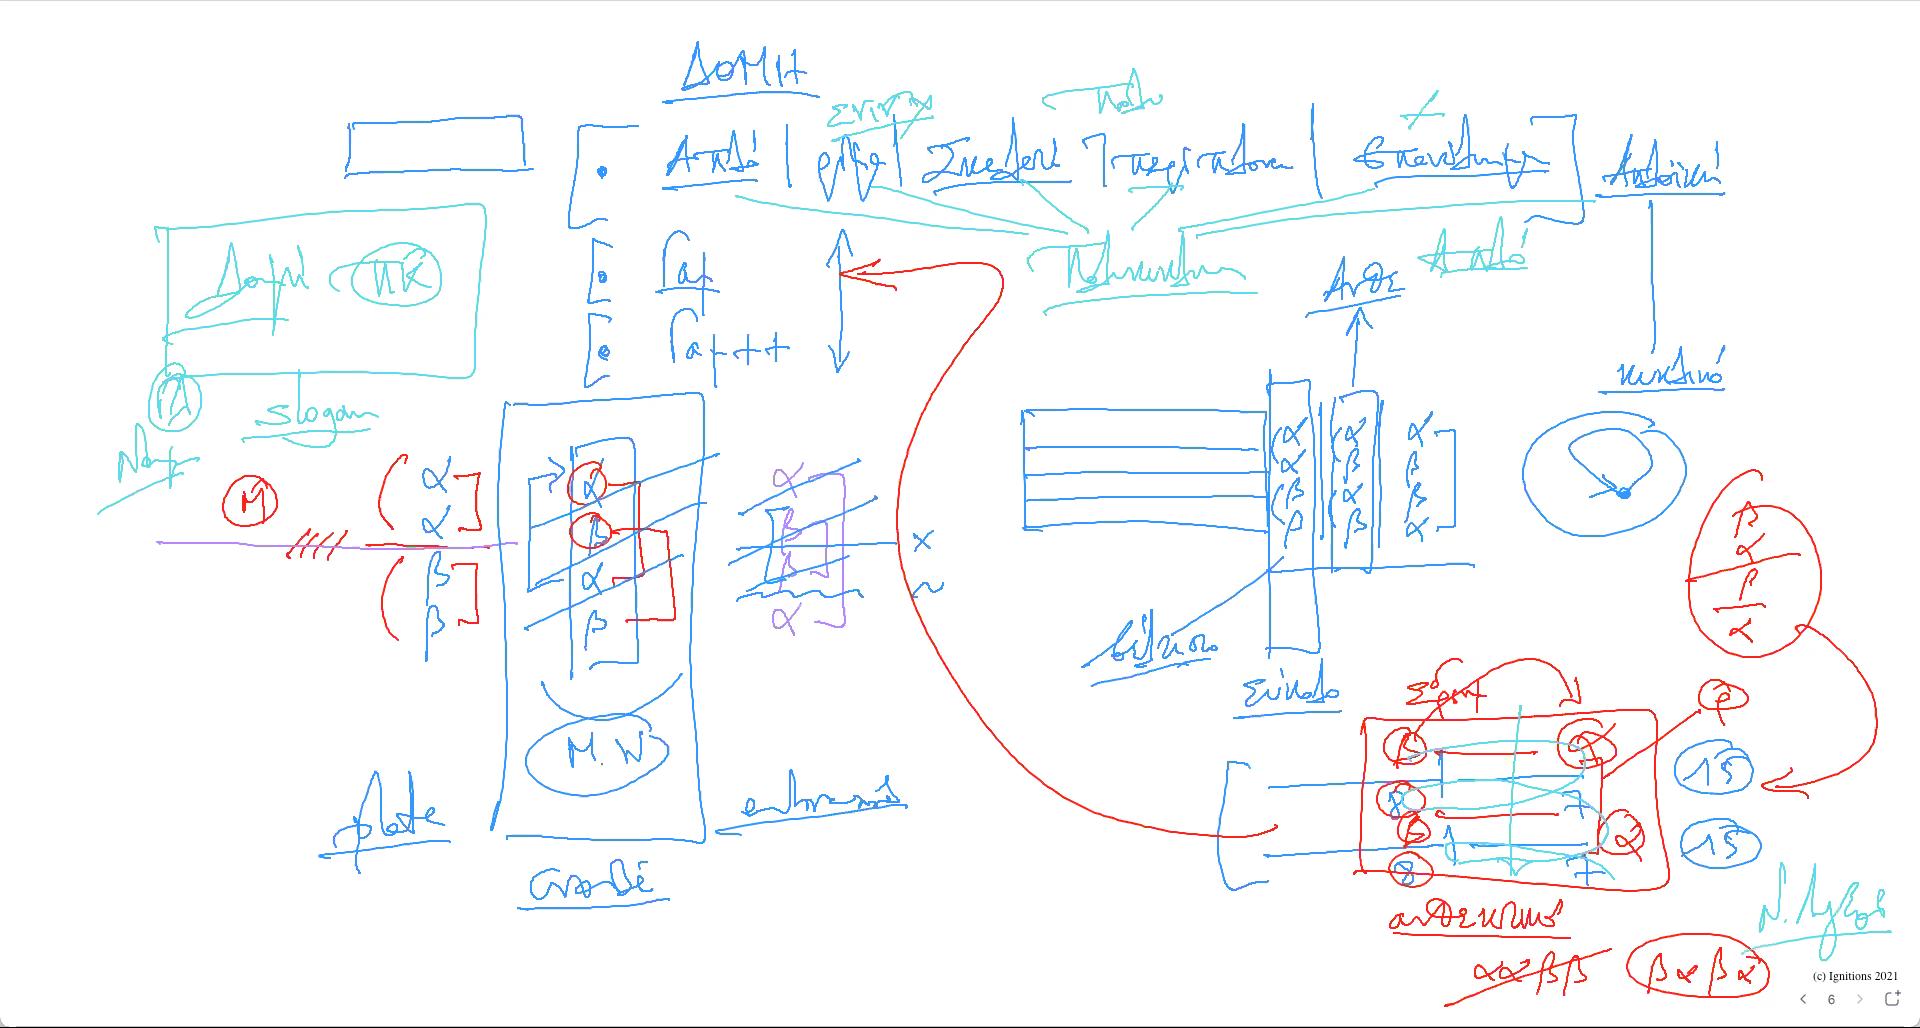 57634 - XIII - Μέρος ΙI - 6ο e-Masterclass Πολυκυκλικότητας. (Dessin)